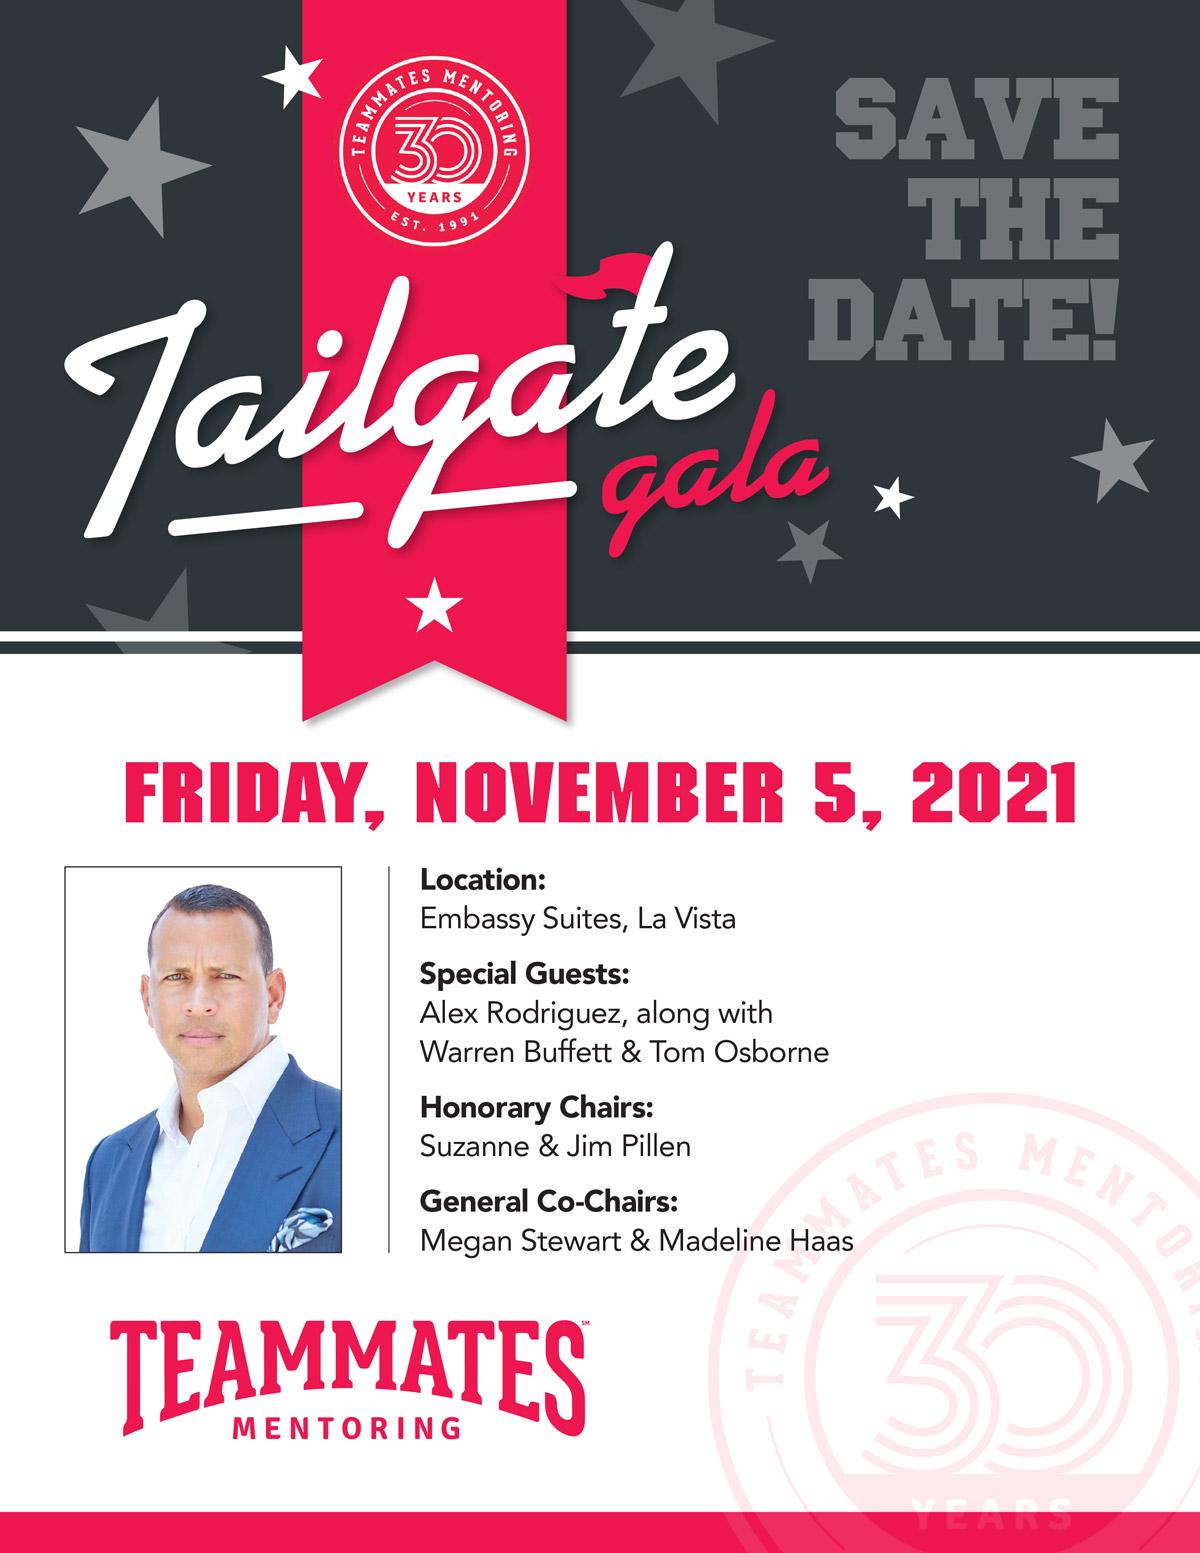 TeamMates Gala 2021. Friday, November 5, 2021 at Embassy Suites, La Vista, NE. Special Guests: Alex Rodriguez, along with Warren Buffett & Tom Osborne.